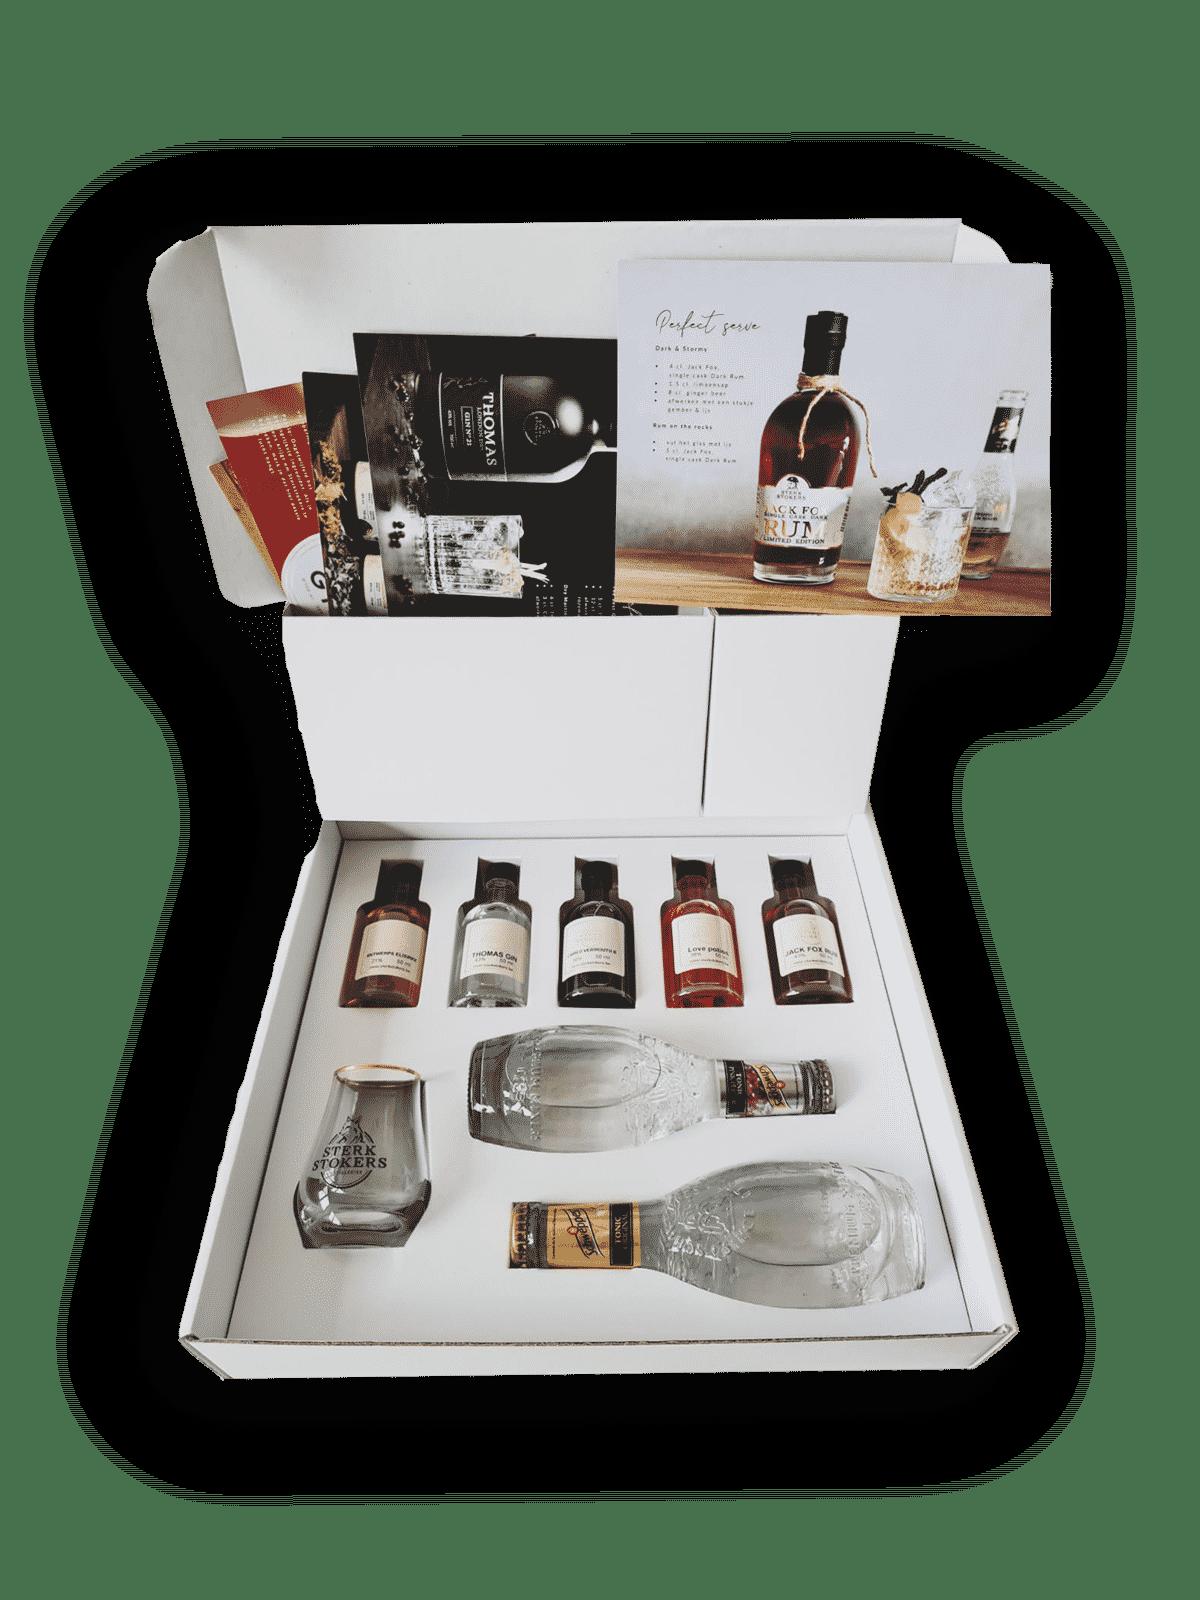 Online Gin Tasting Box Sterkstokers